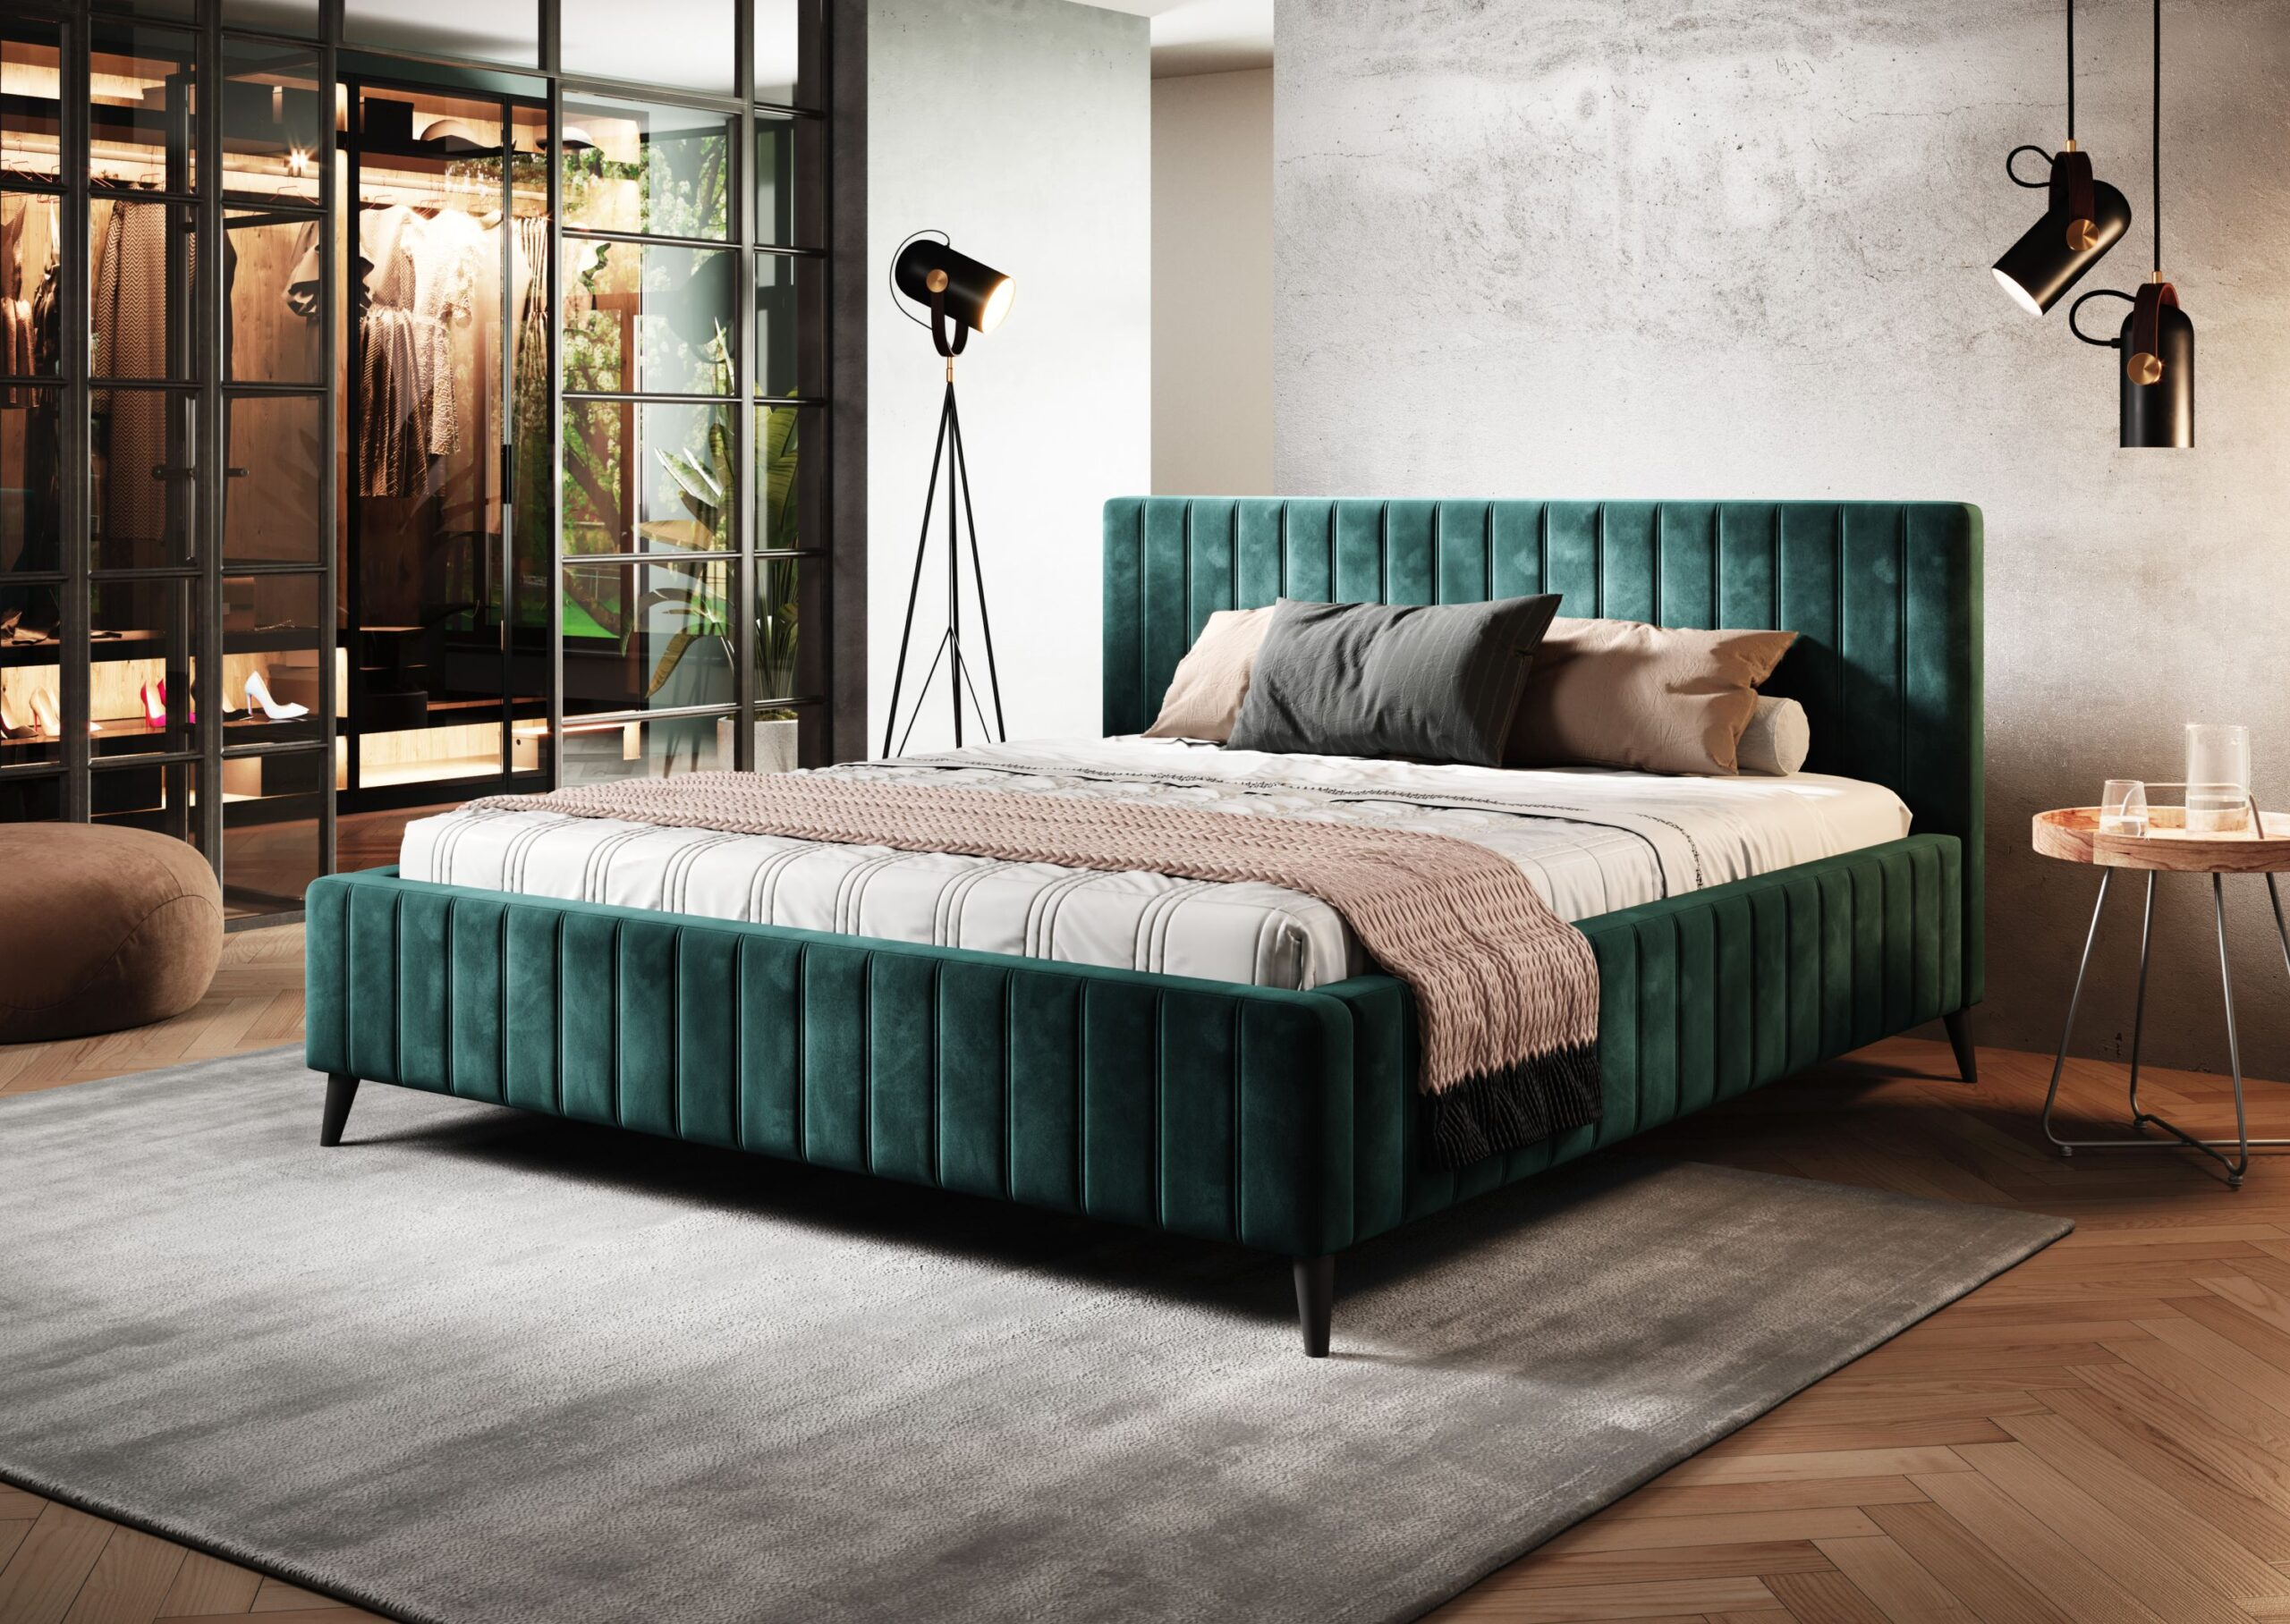 Full Size of Betten Schlafzimmer Rume Ostermannde Bett 200x220 Wohnzimmer Polsterbett 200x220